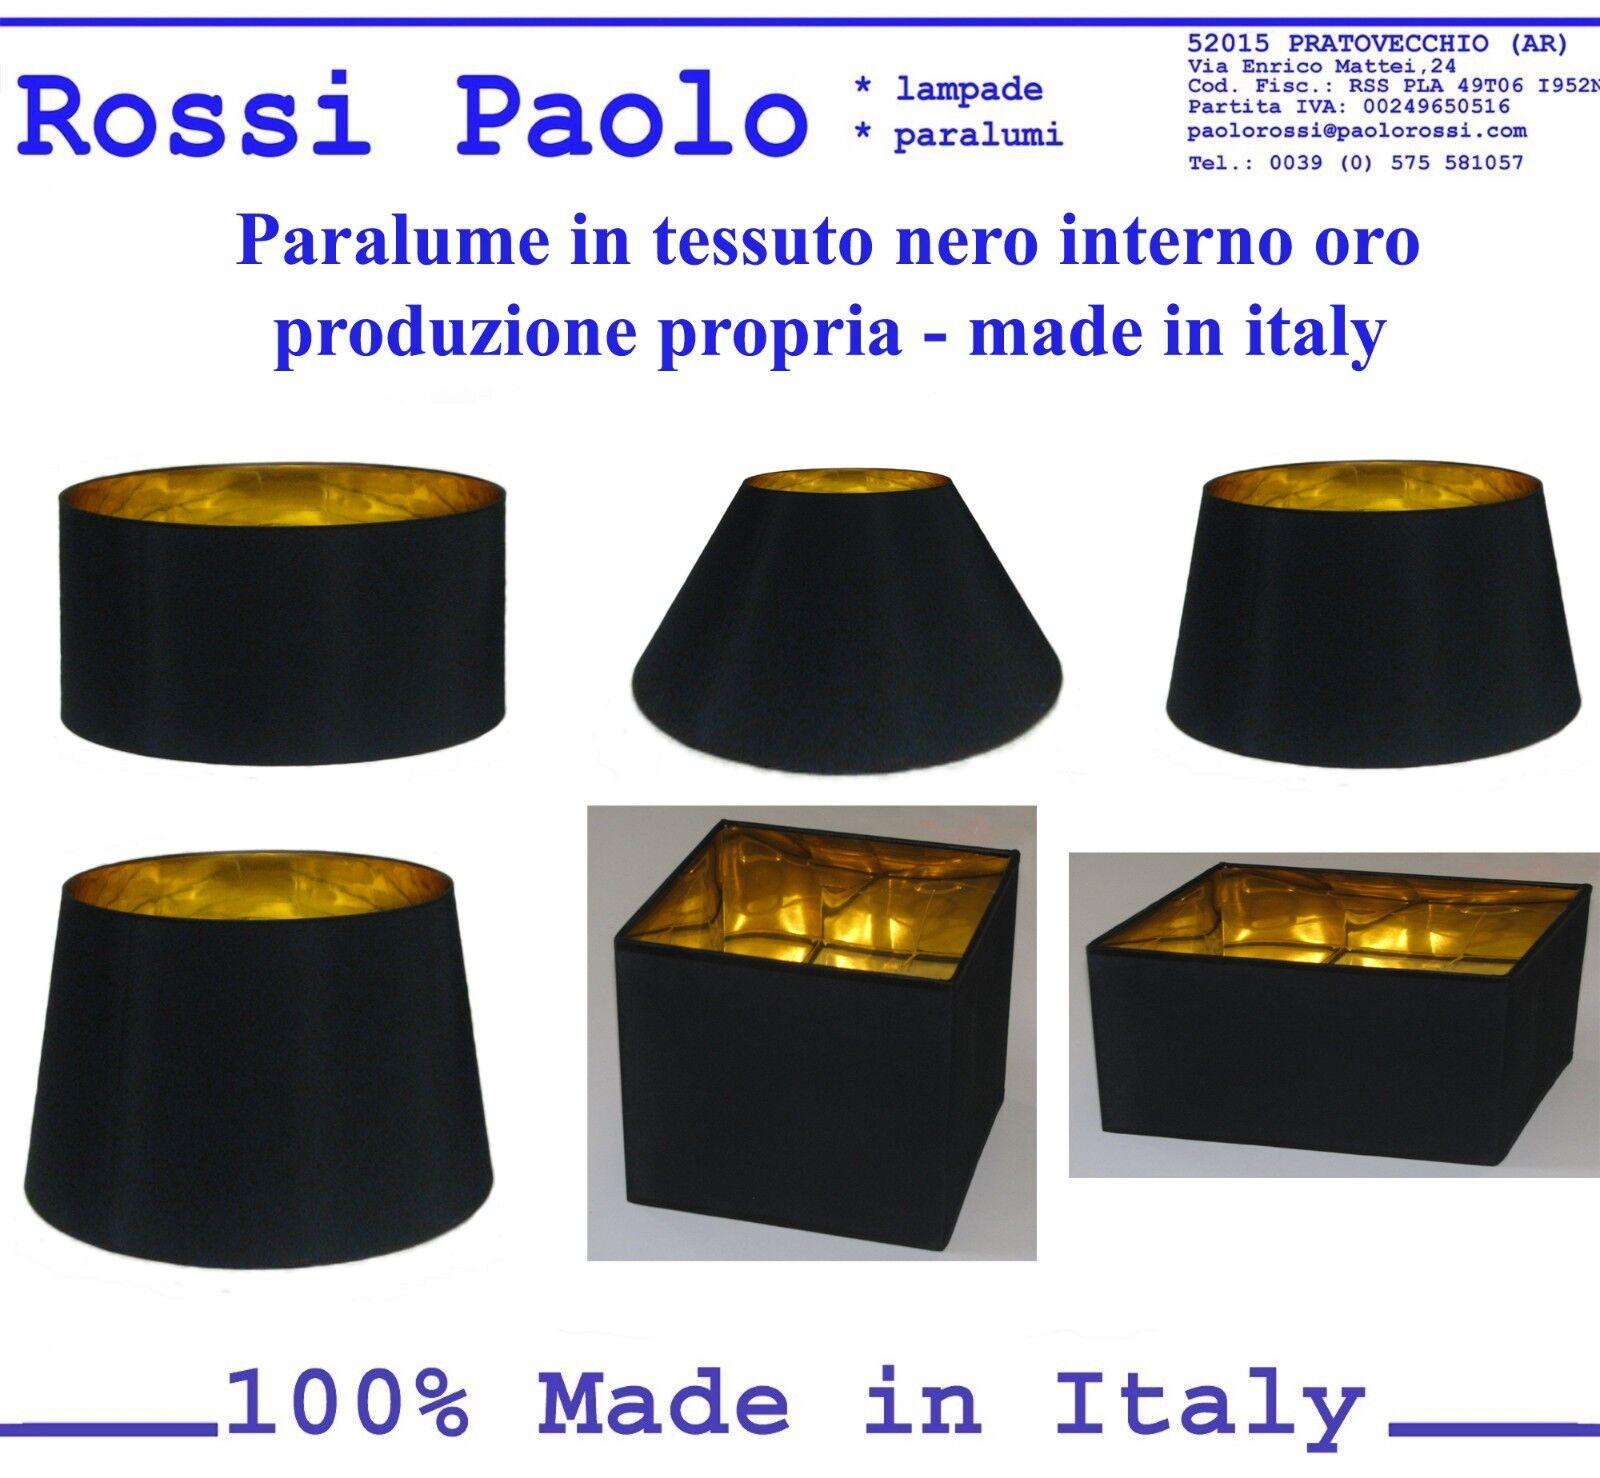 Paralume paraluce coprilampada in tessuto nero interno oro - made in Italy